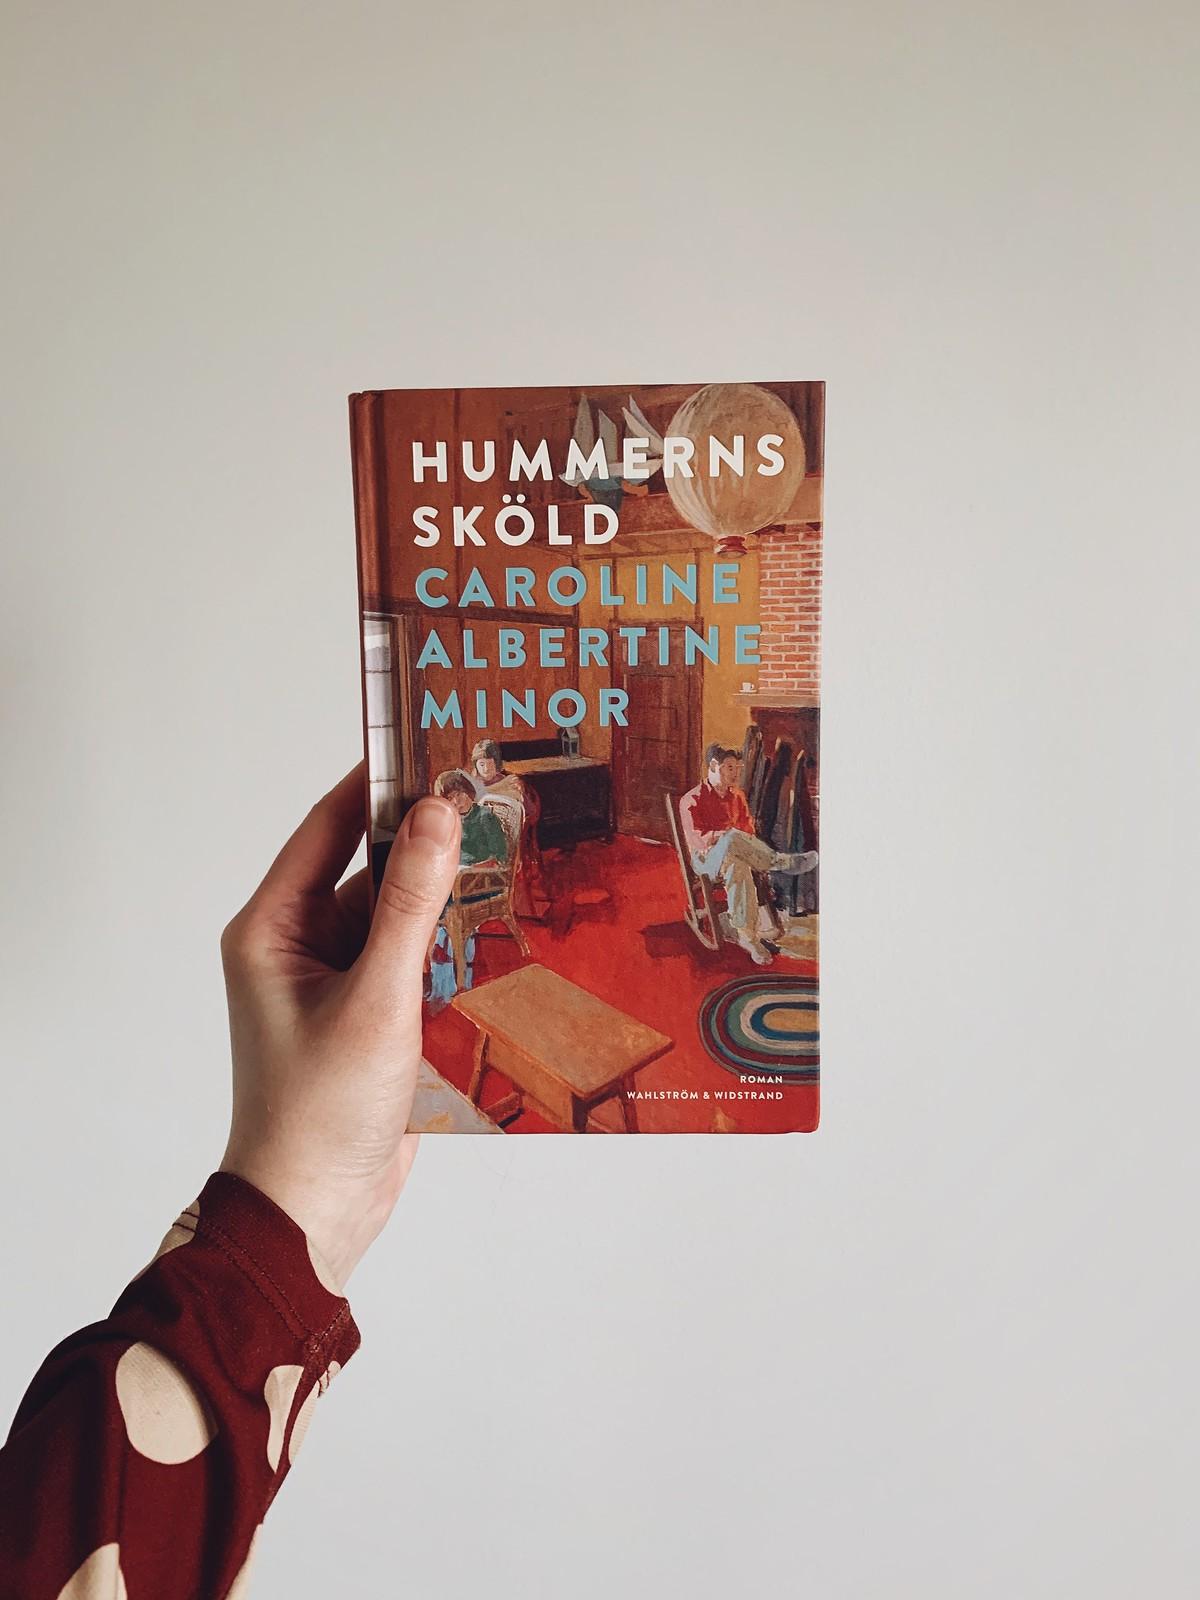 Hummerns Sköld - Caroline Albertine Minor